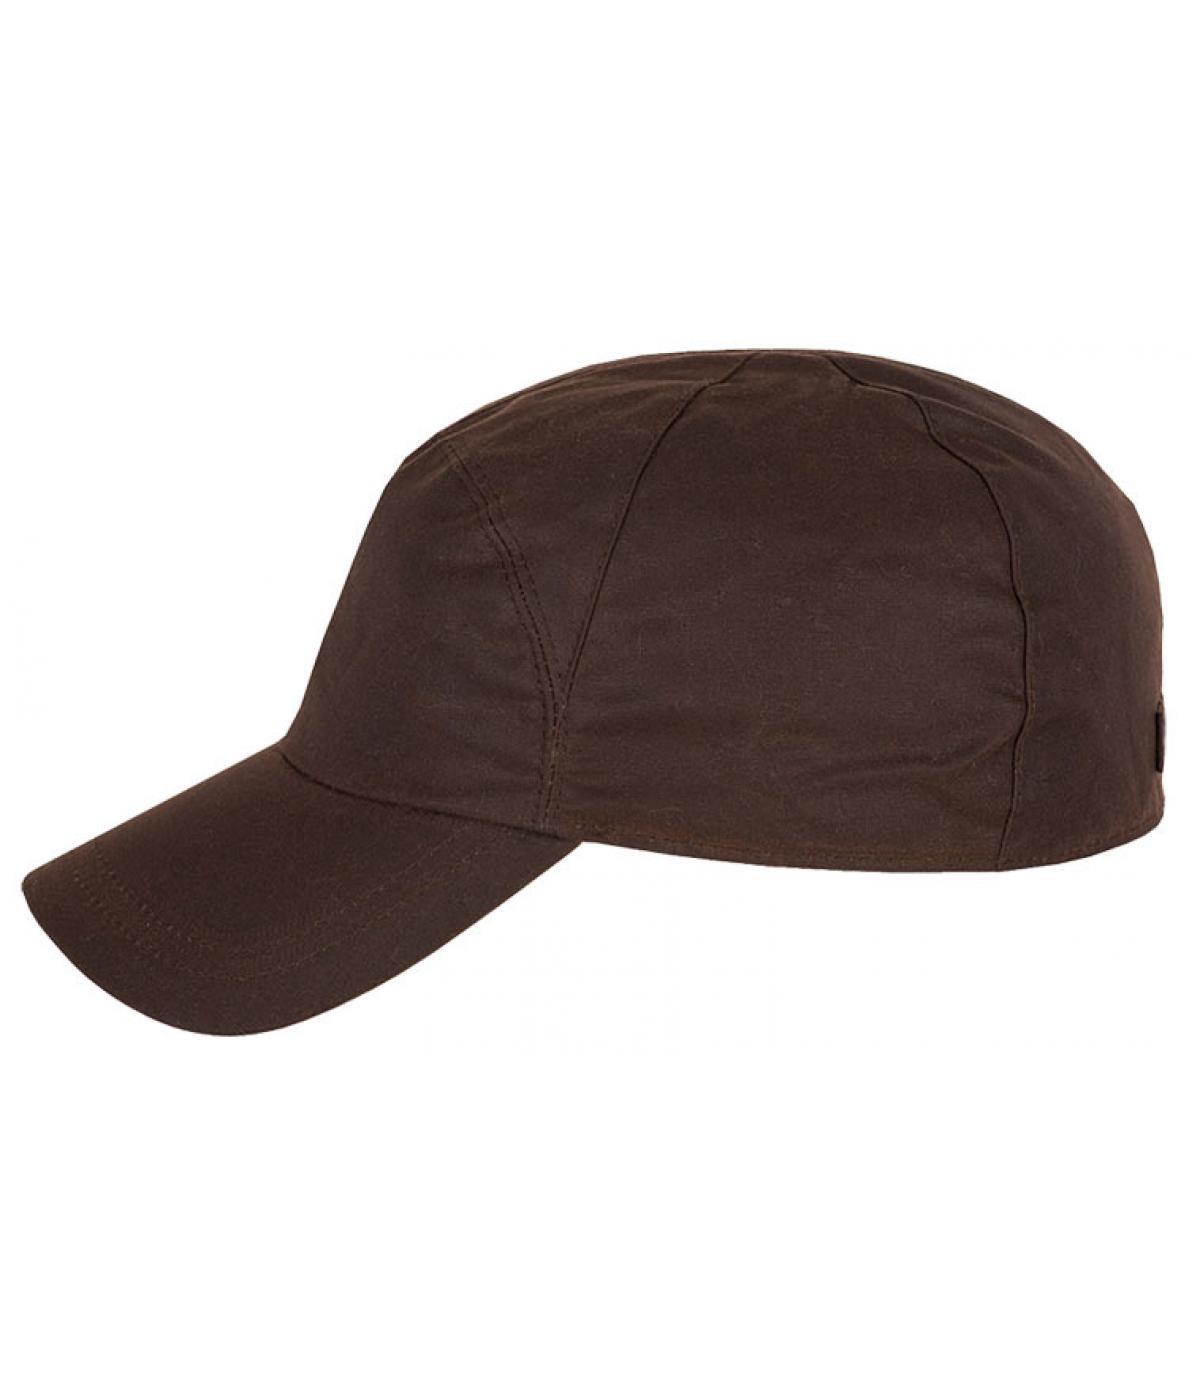 Cappellino maryman stetson